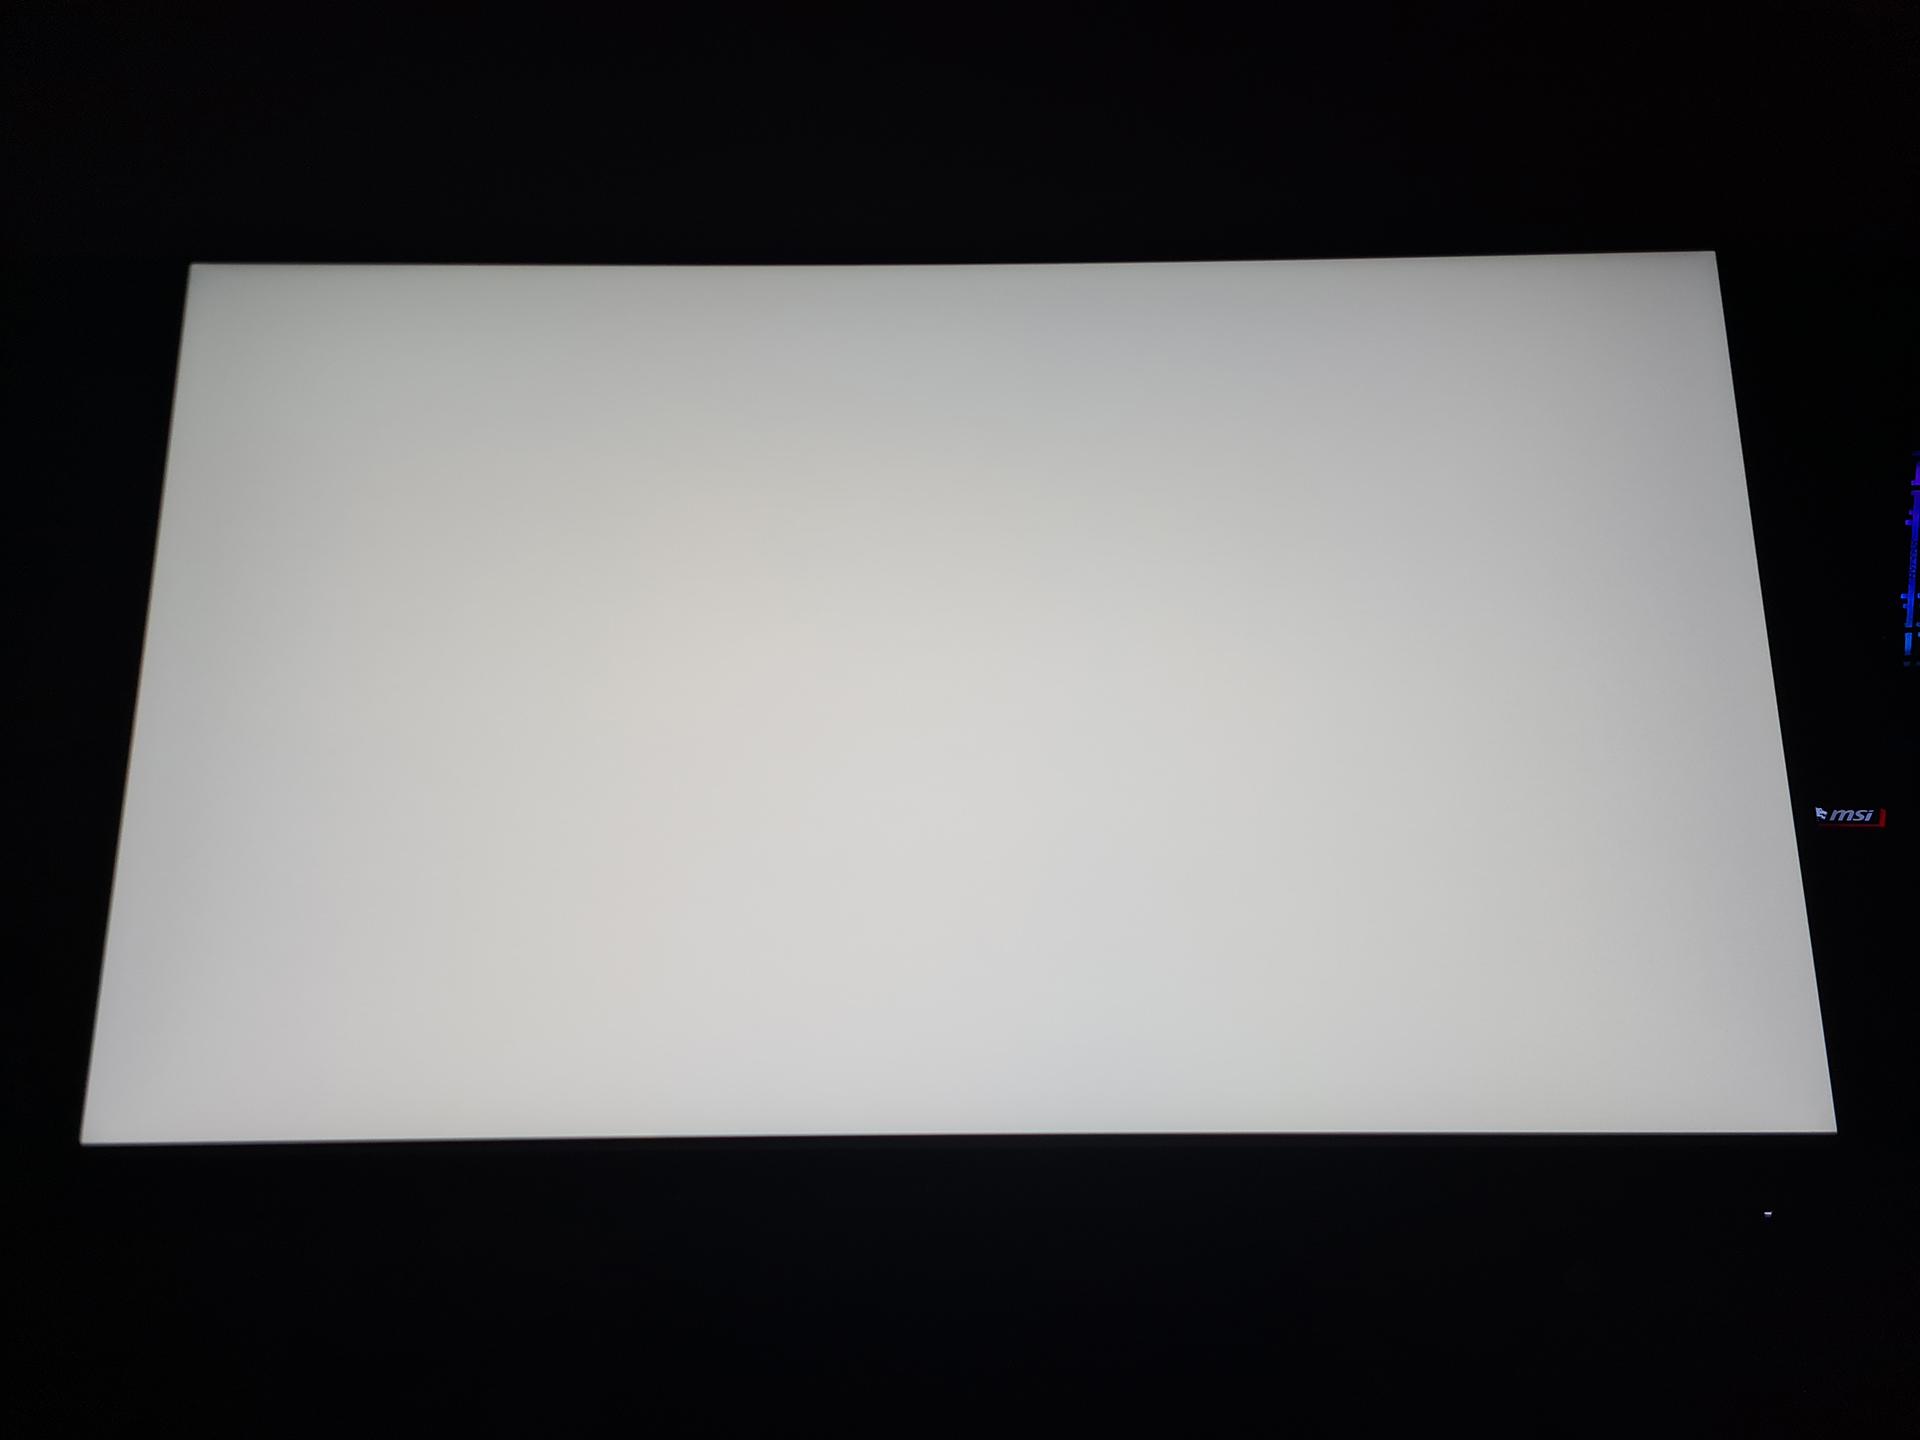 MSI Oculux NXG253R - Blickwinkel 1